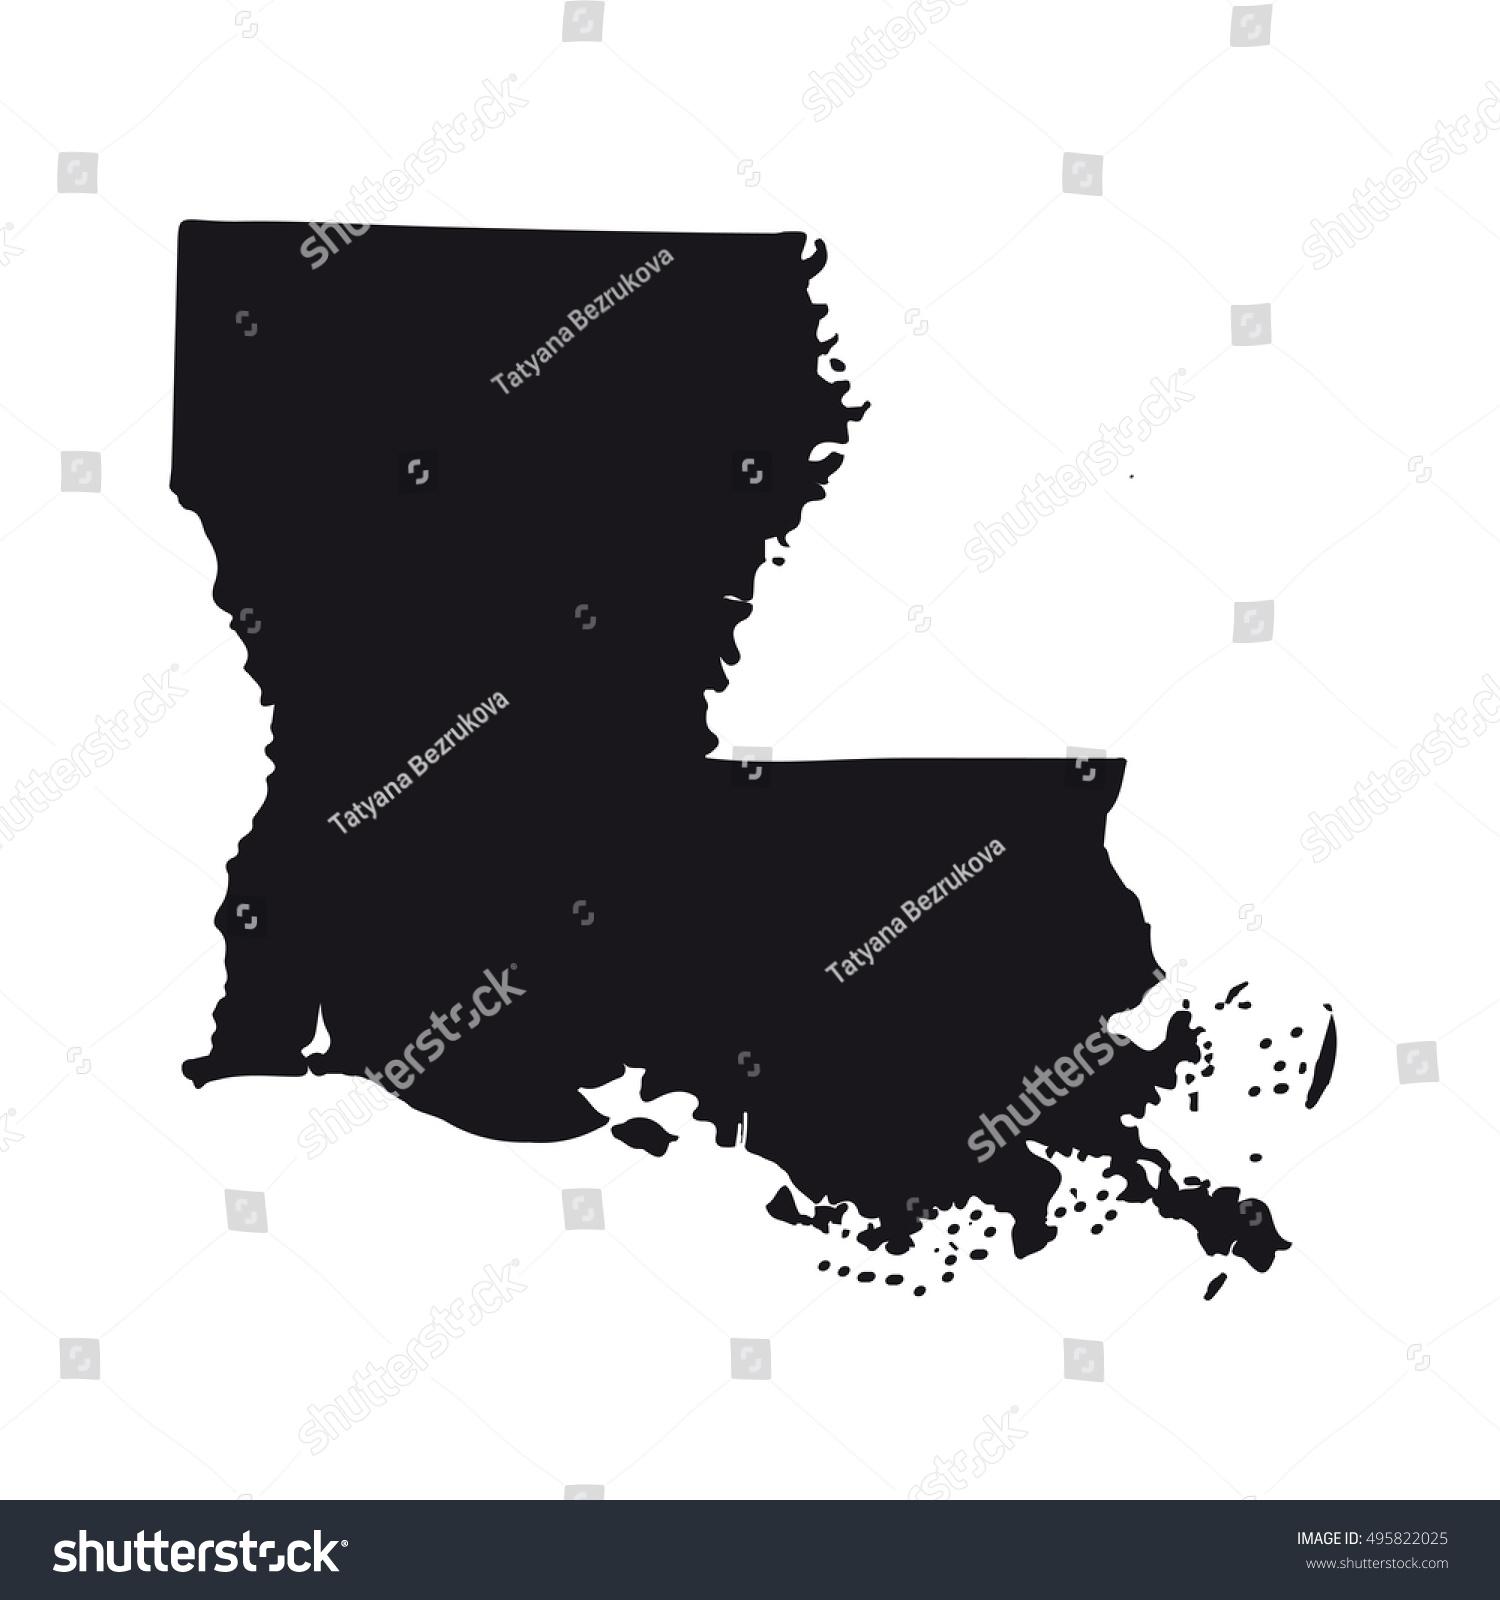 Louisiana On Usa Map Louisiana On A Map Of The Usa Thirteen